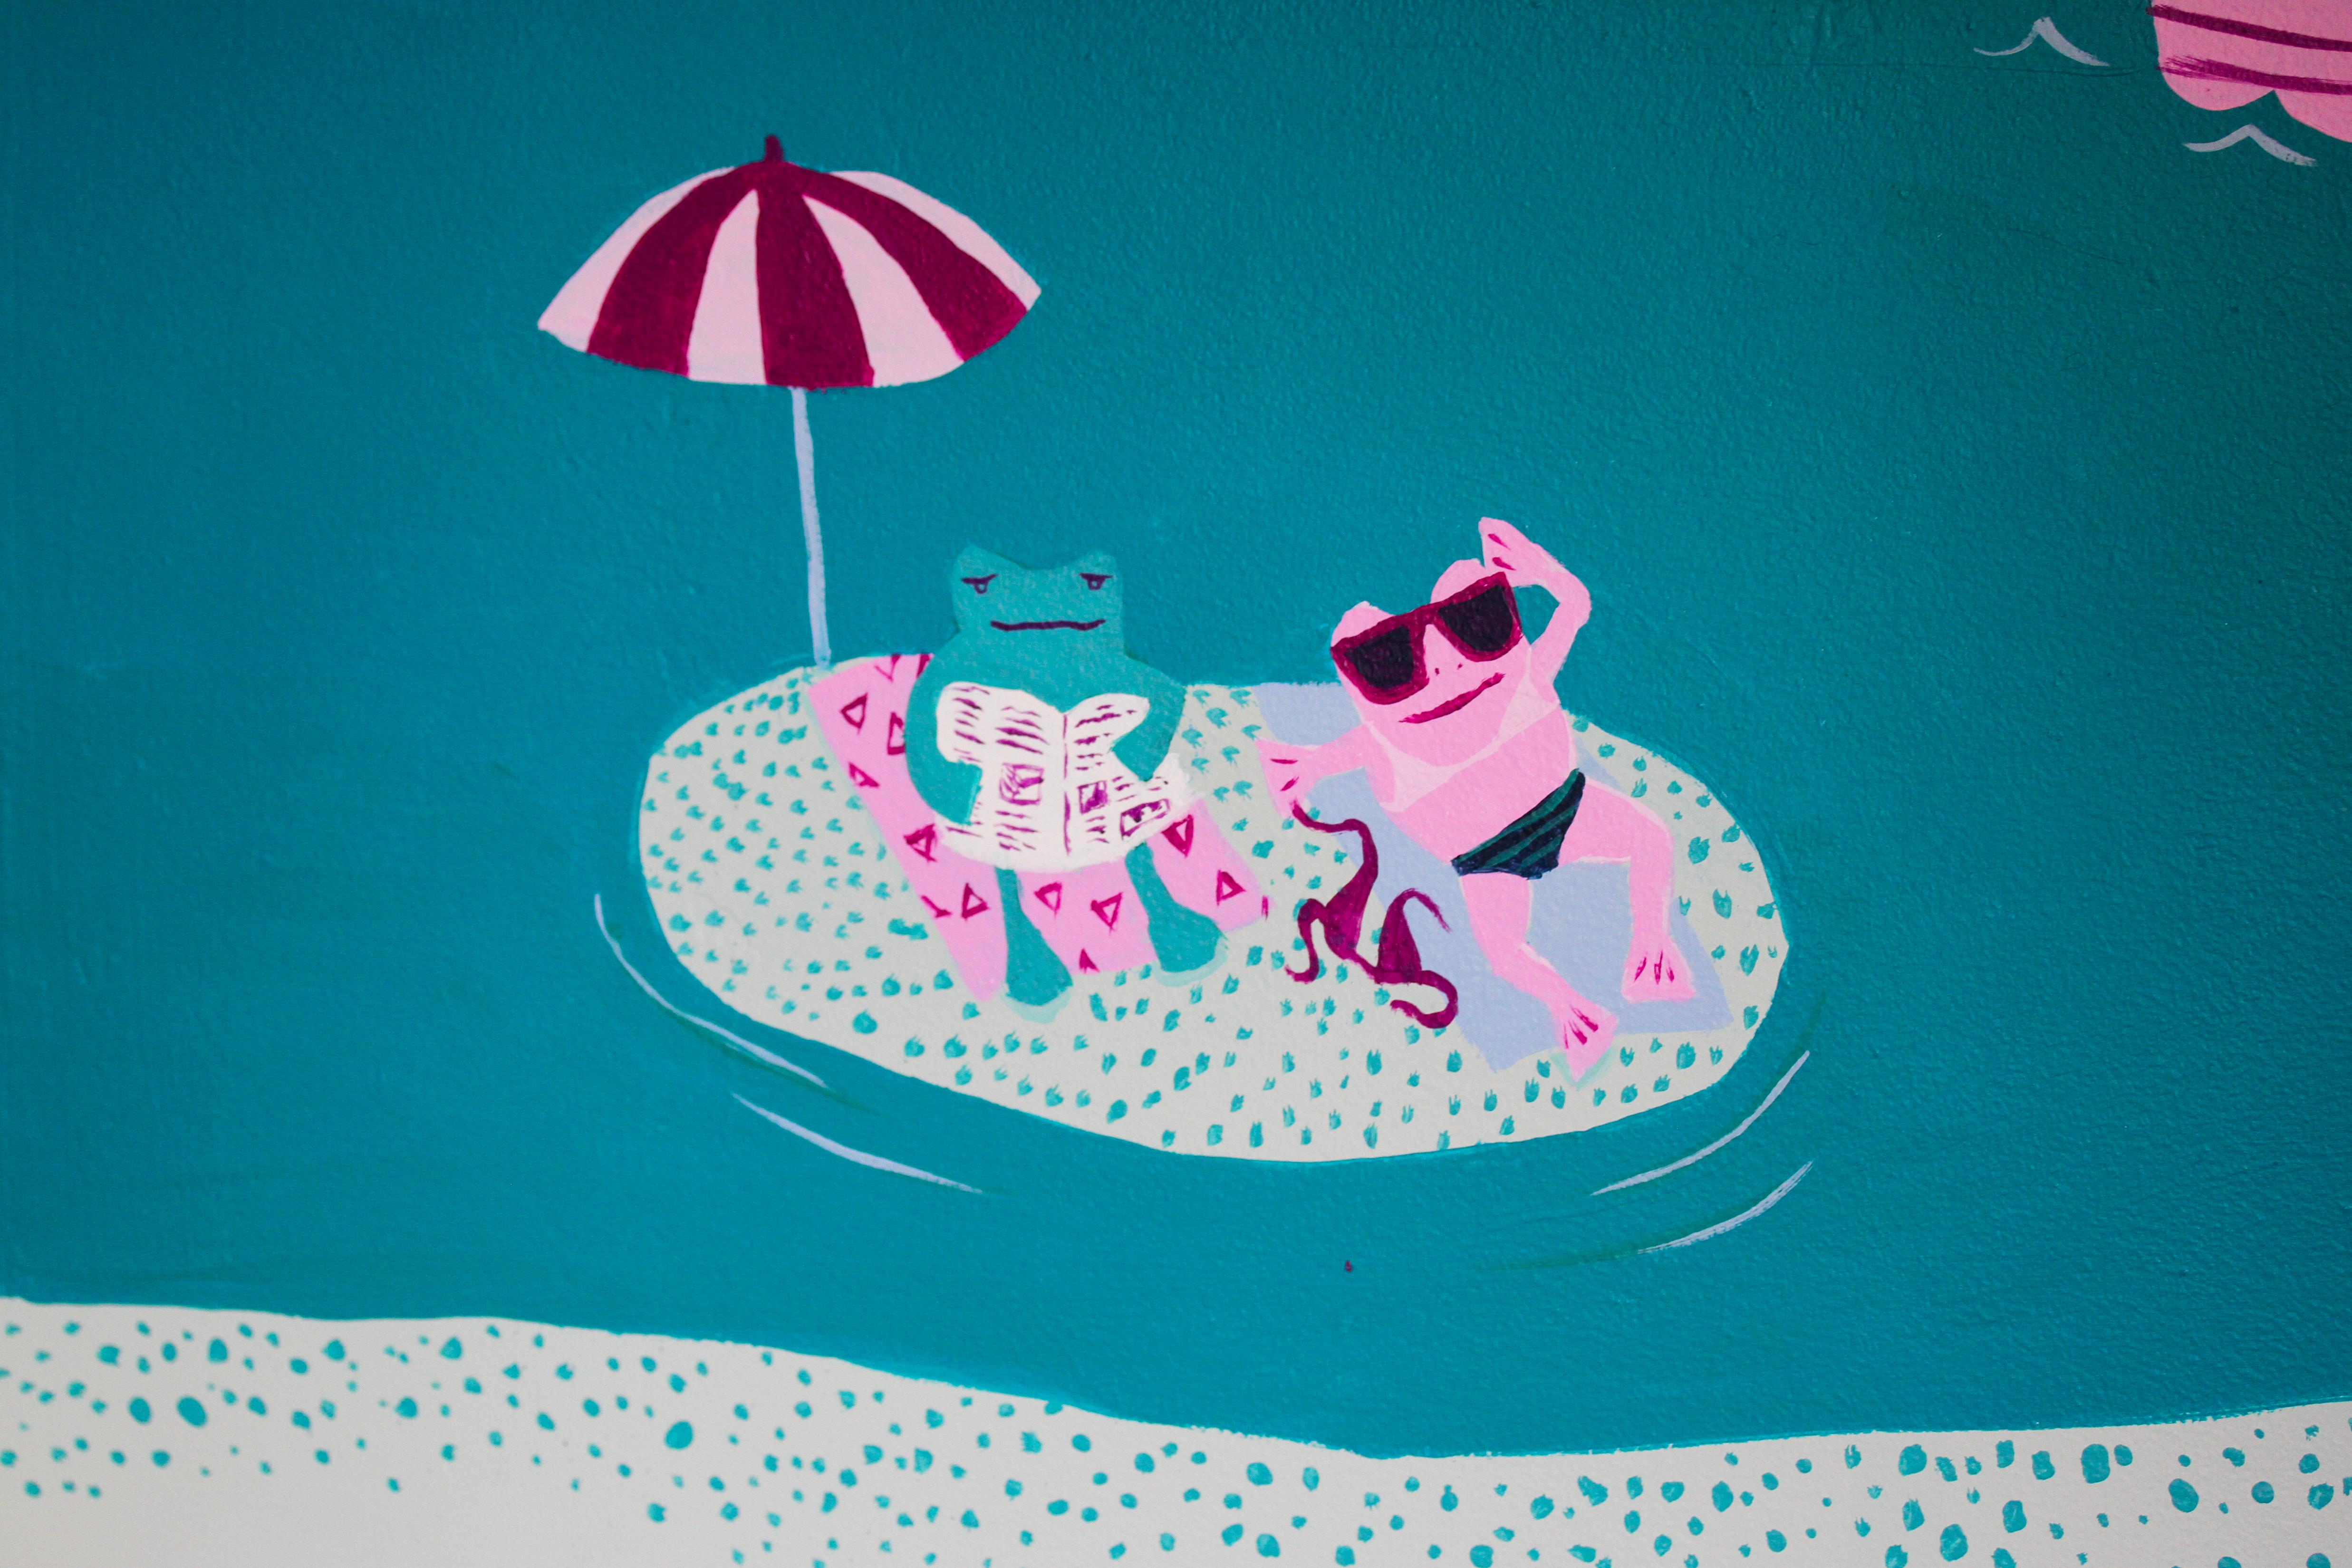 mural detail: frogs sunbathing on an island